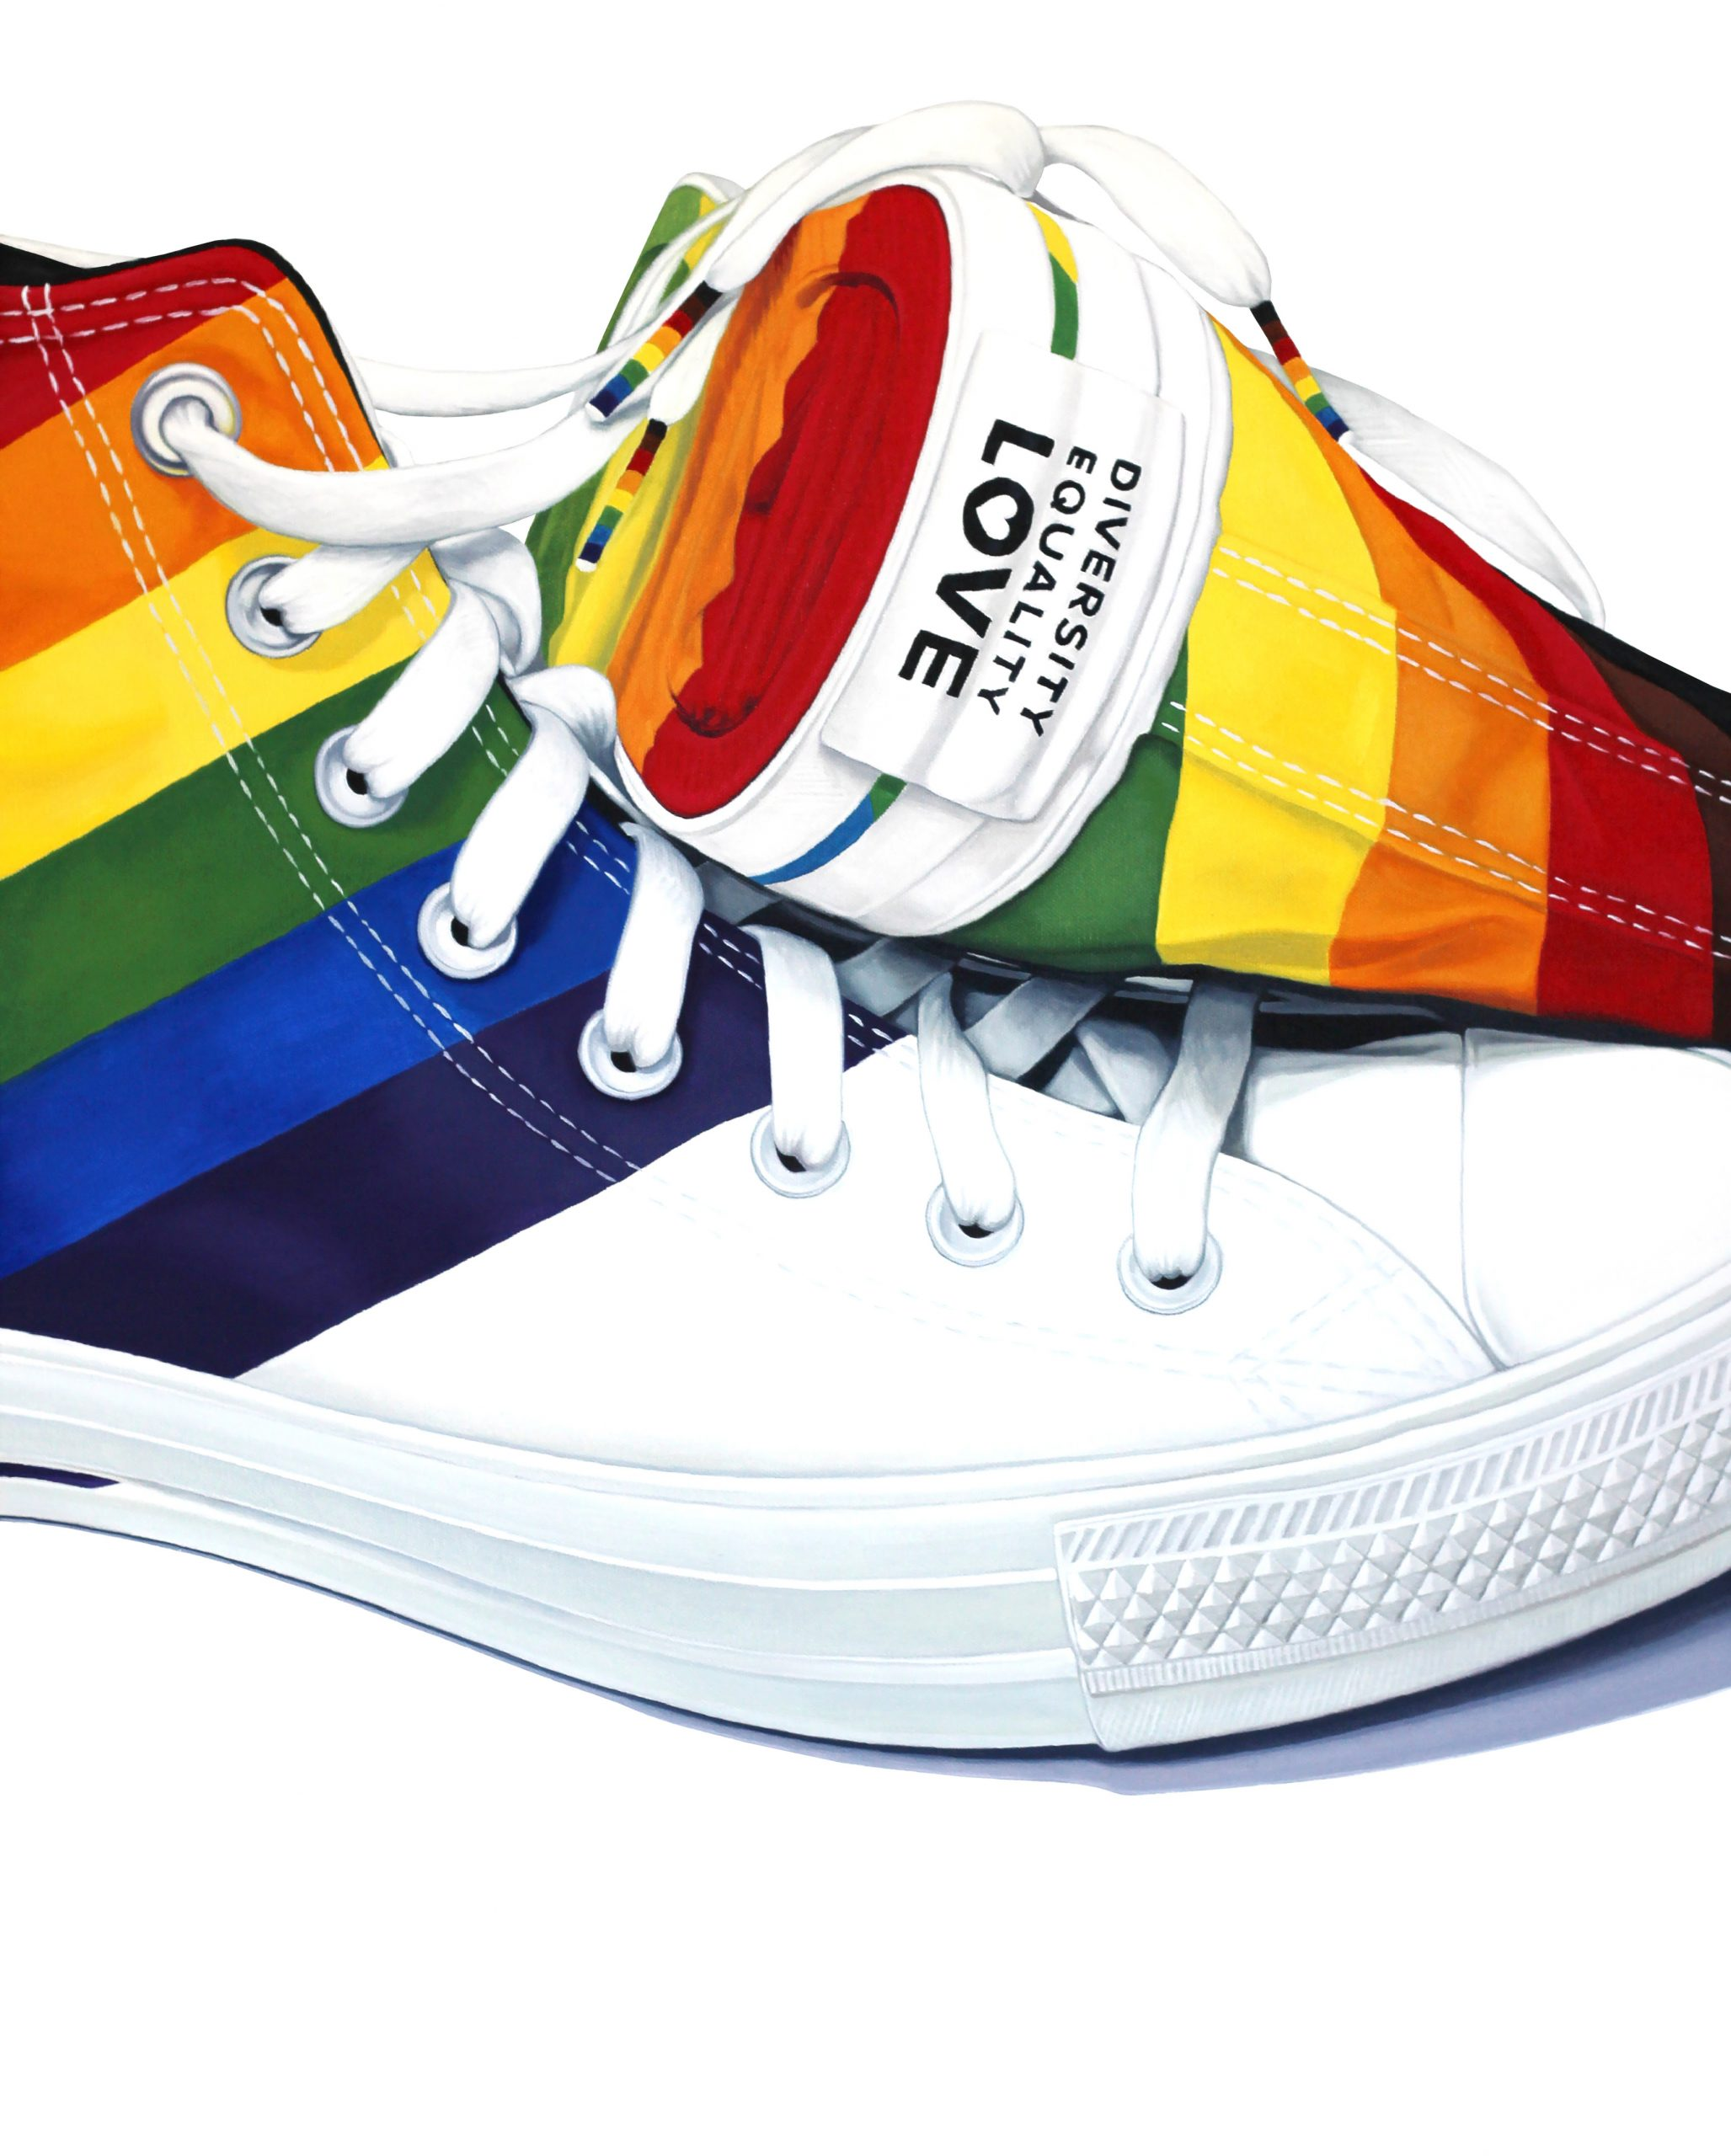 2 Effective Ways of Celebrating Pride Through Art